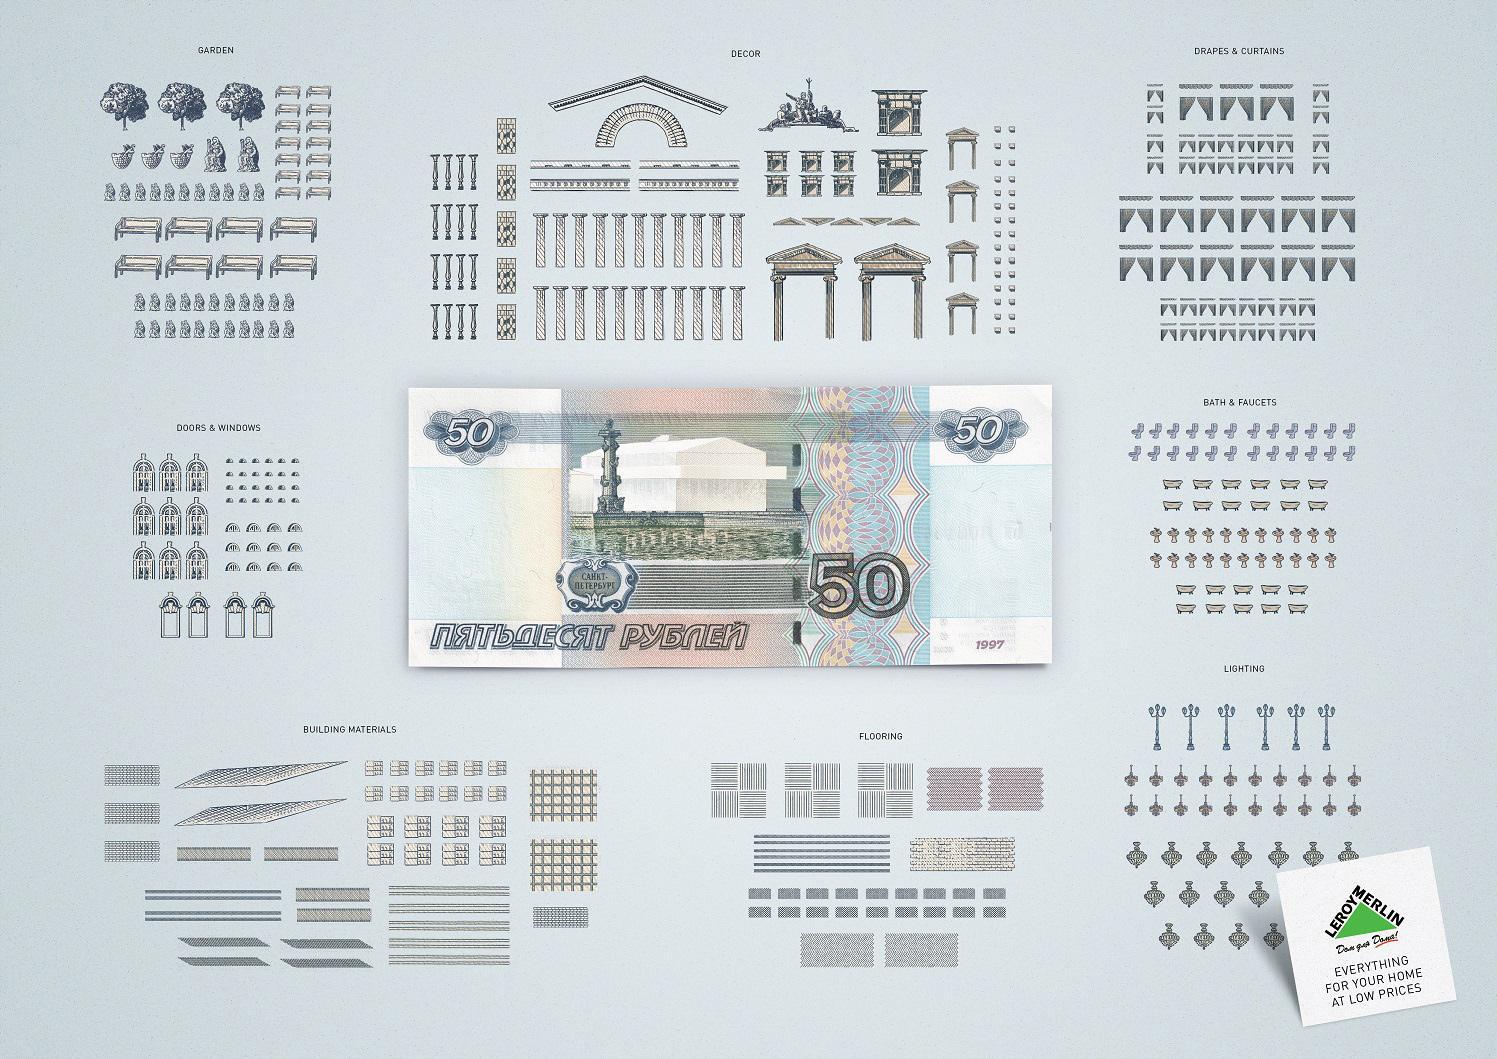 Leroy Merlin Print Ad -  50 rubles